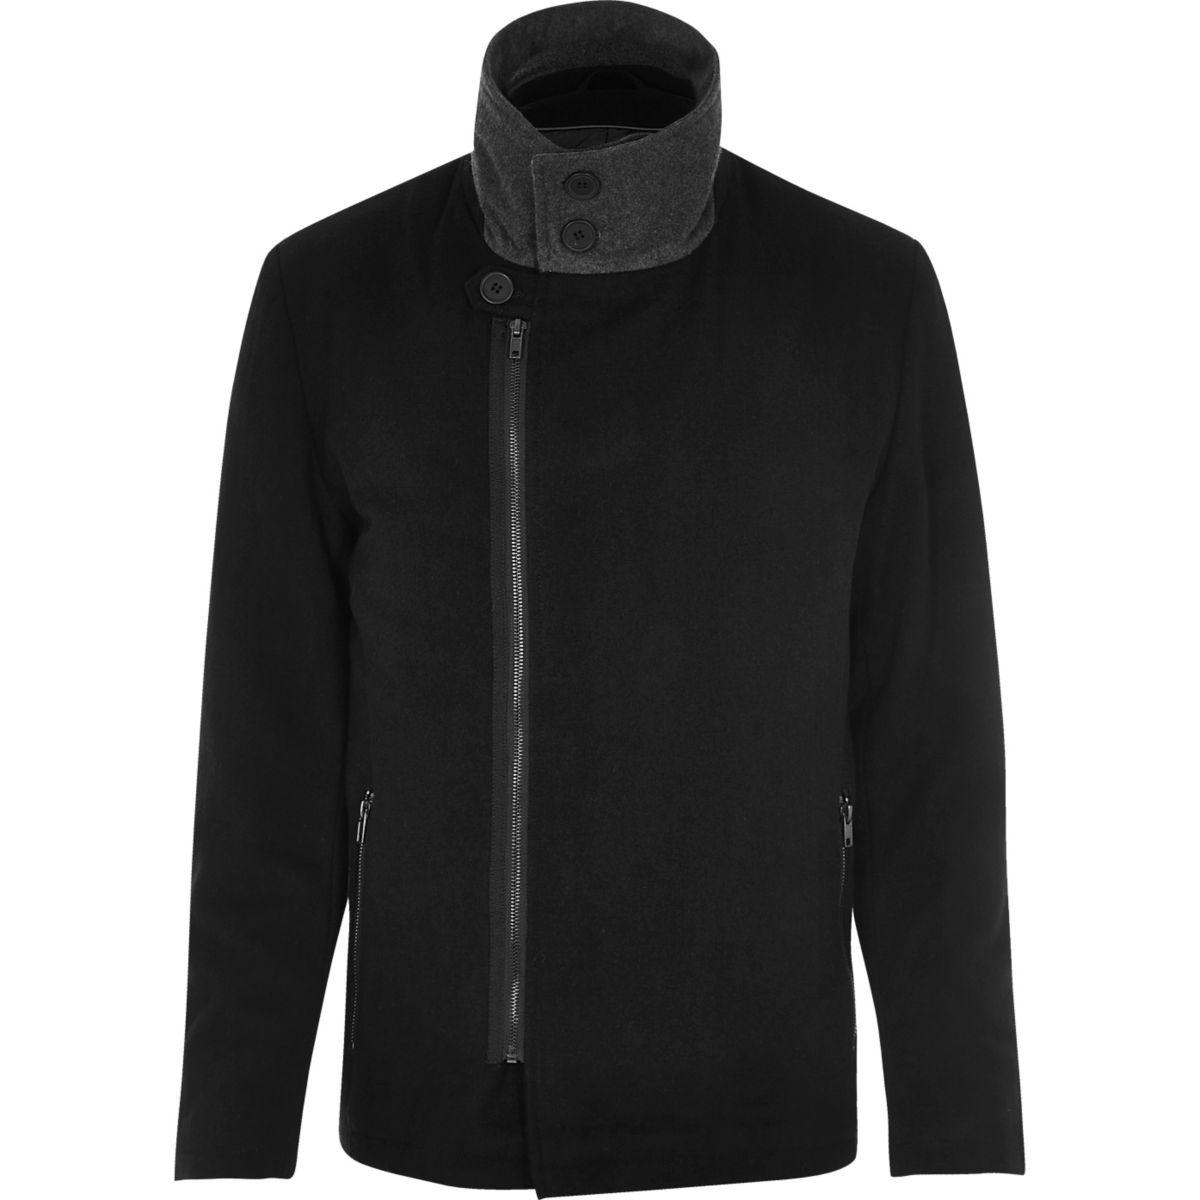 Black Vito turtleneck jacket